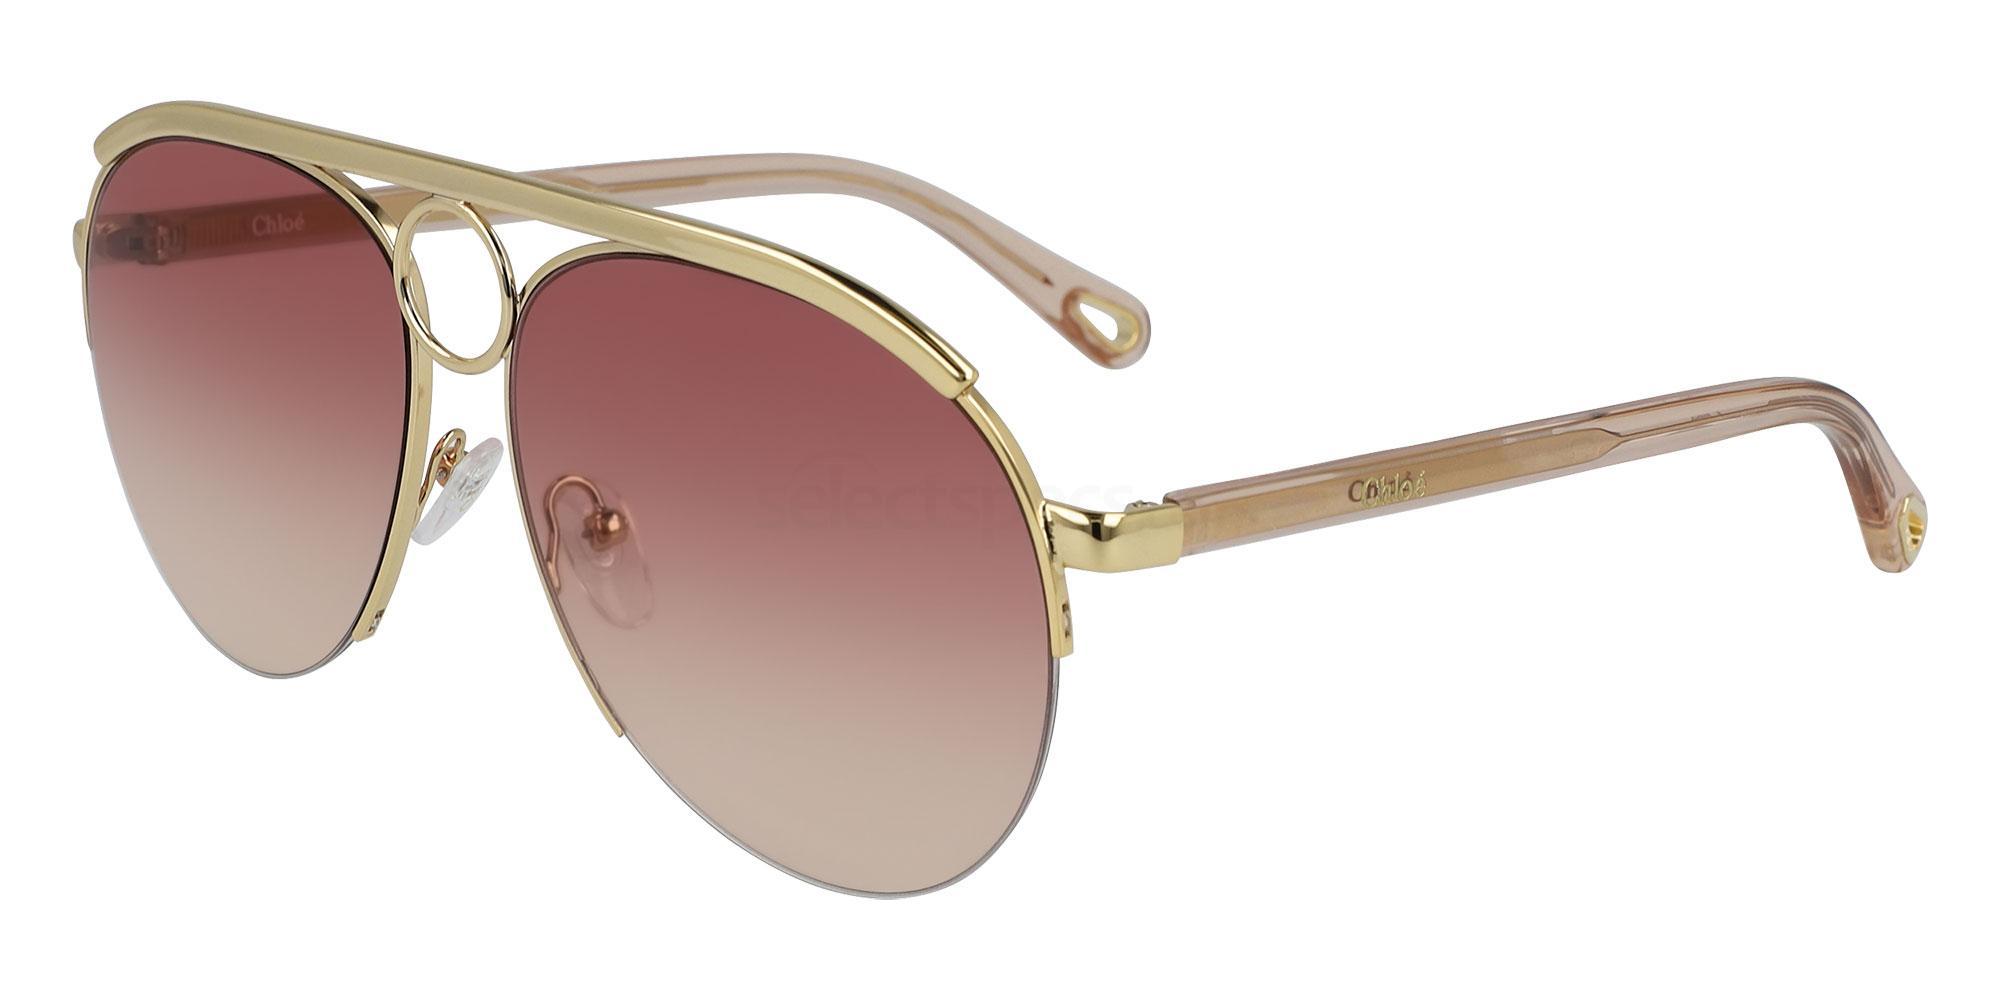 818 CE152S Sunglasses, Chloe